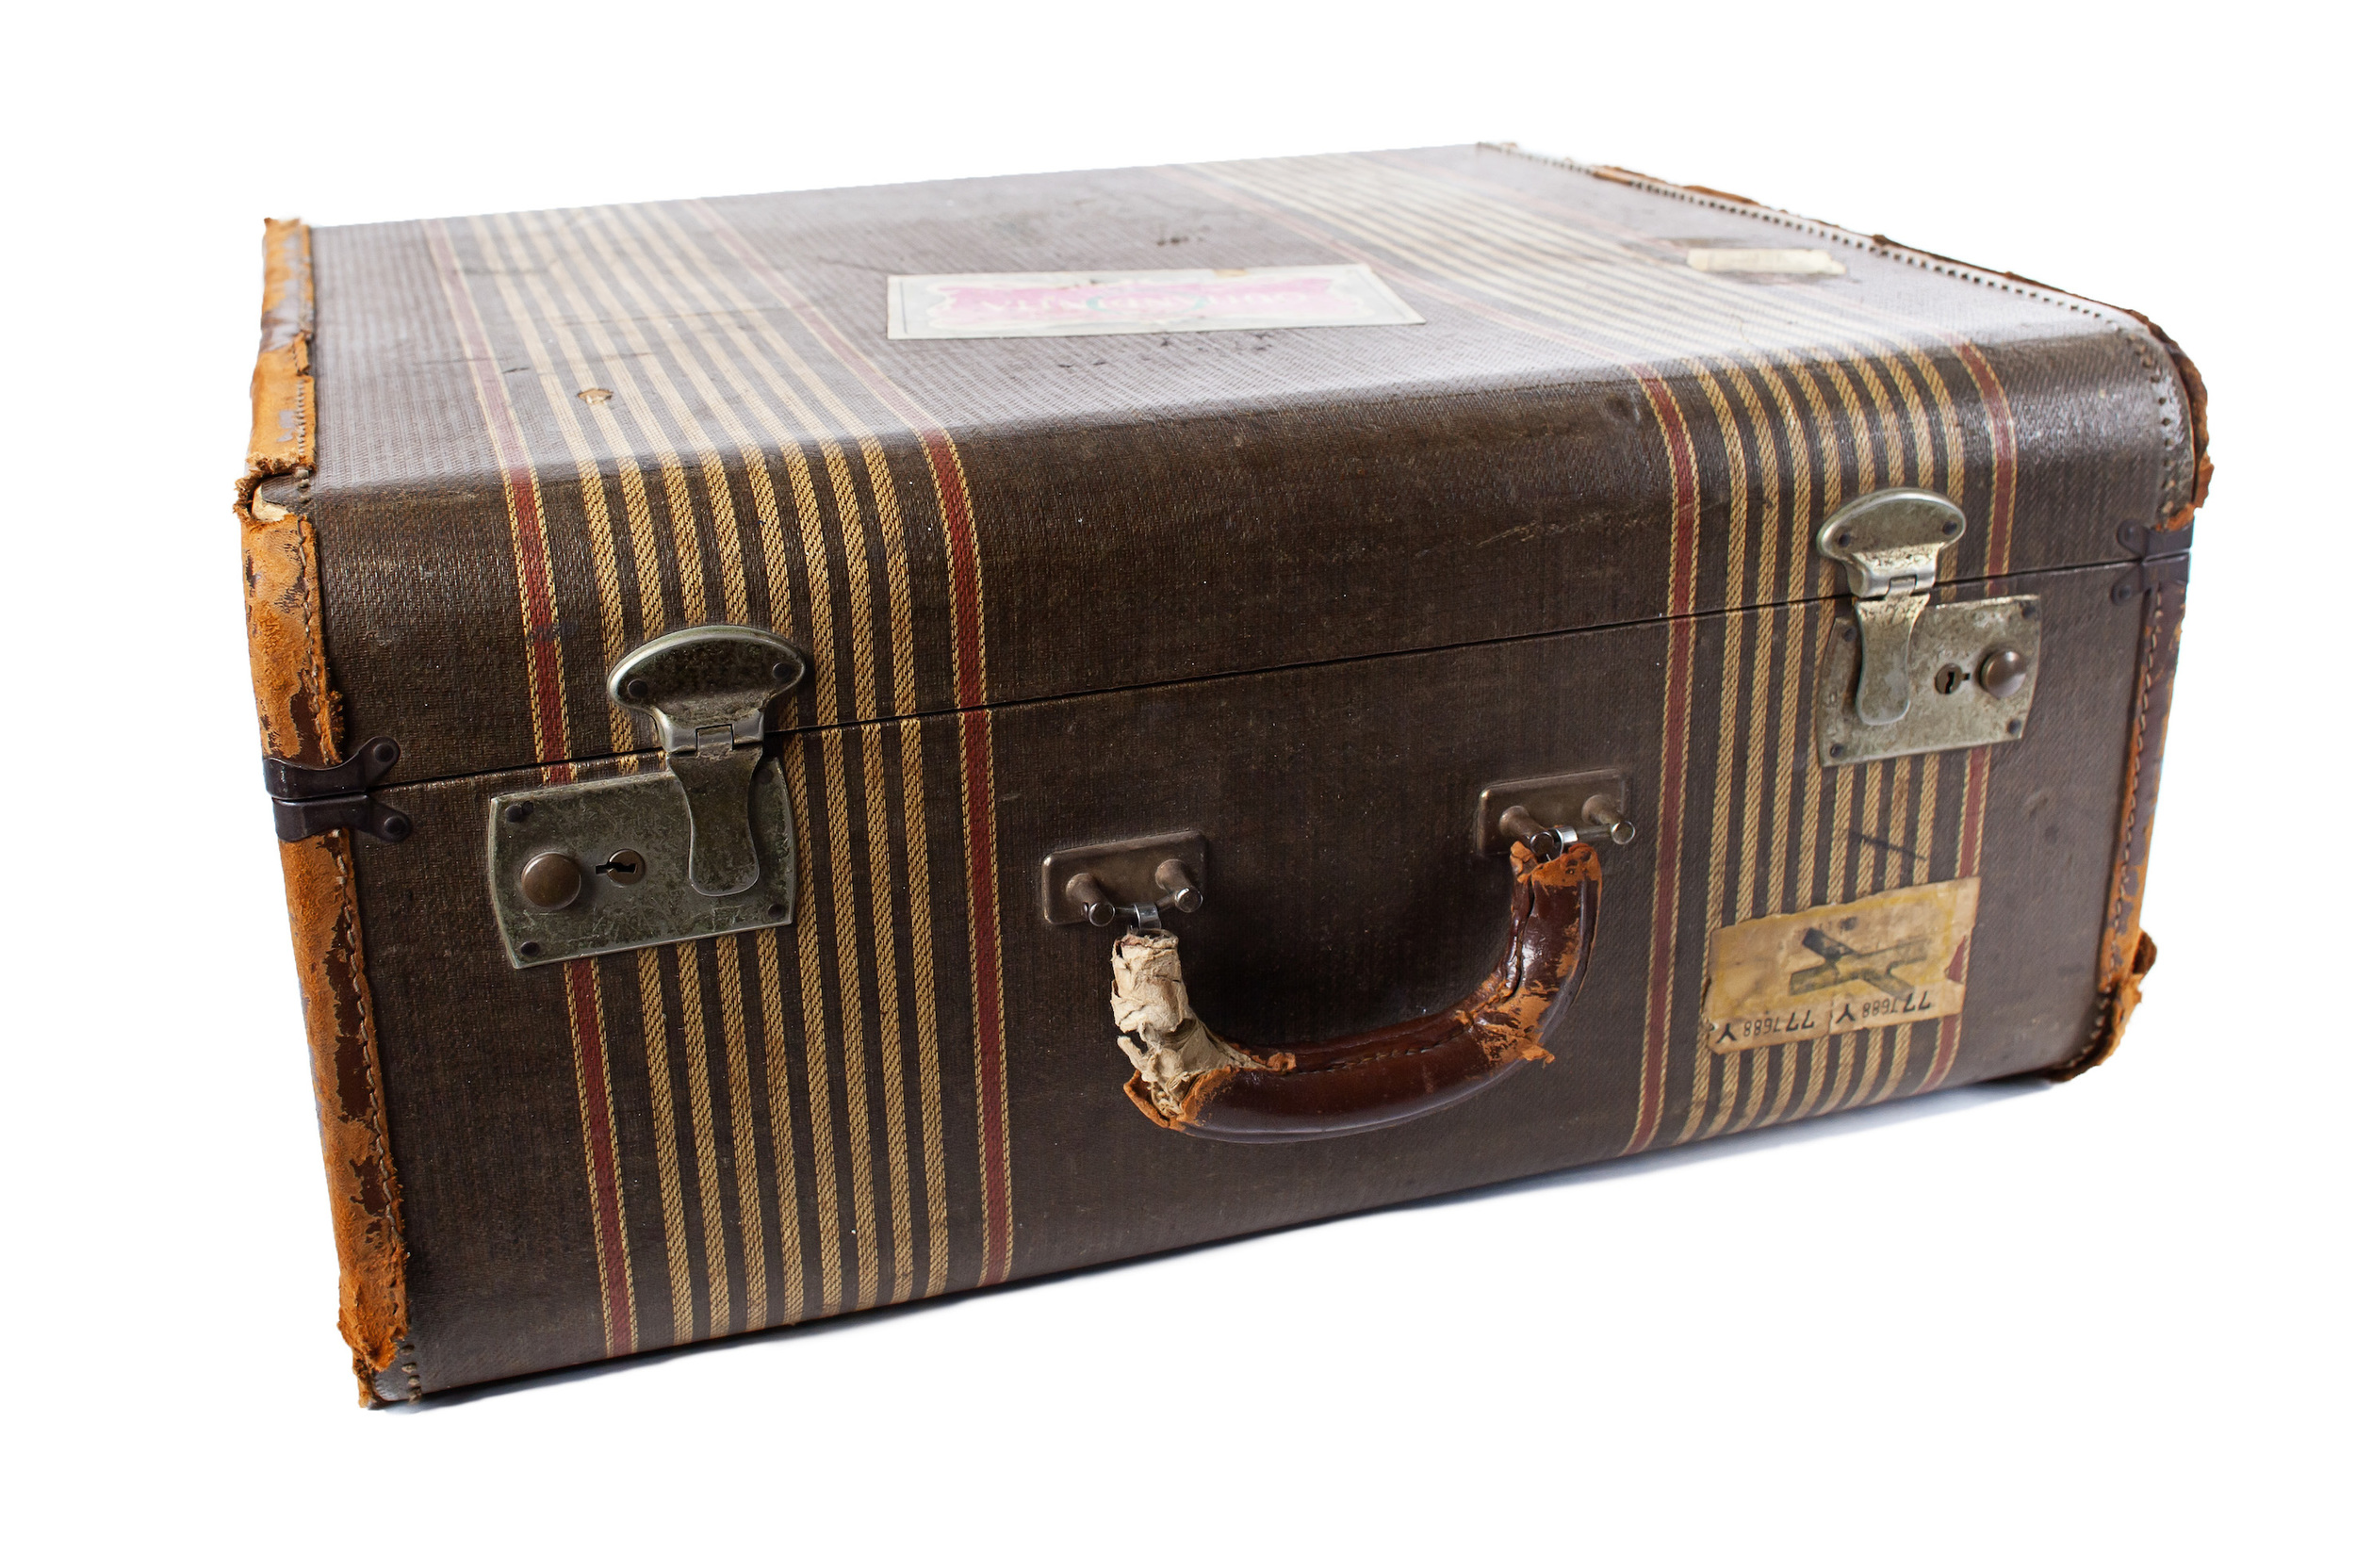 Stripe Suitcase